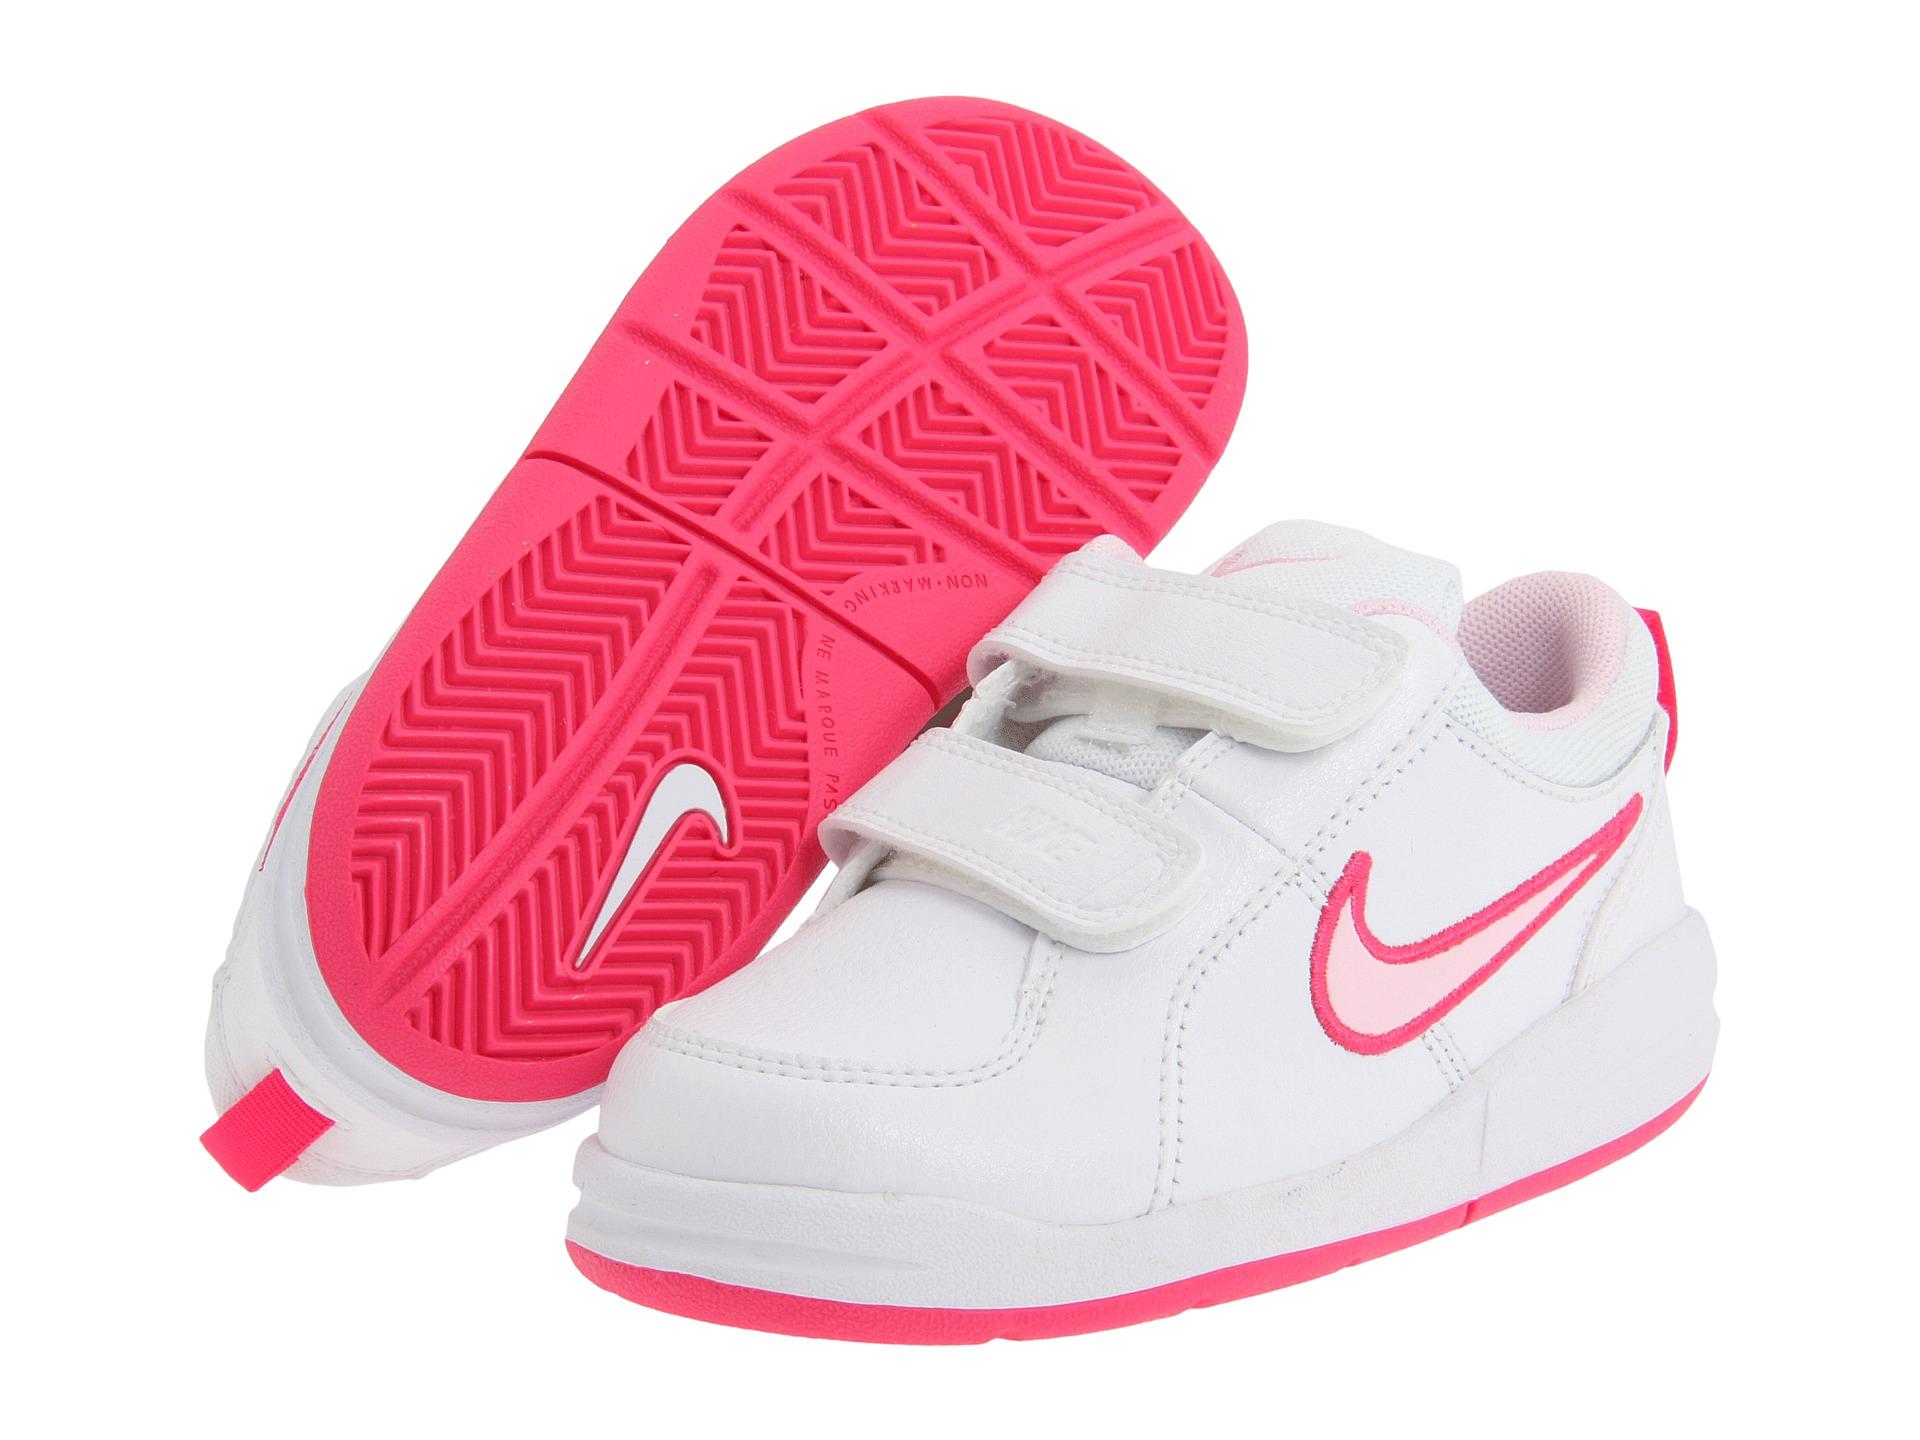 Nike Kids Pico 4 (Infant/Toddler) White/Spark/Prism Pink ...